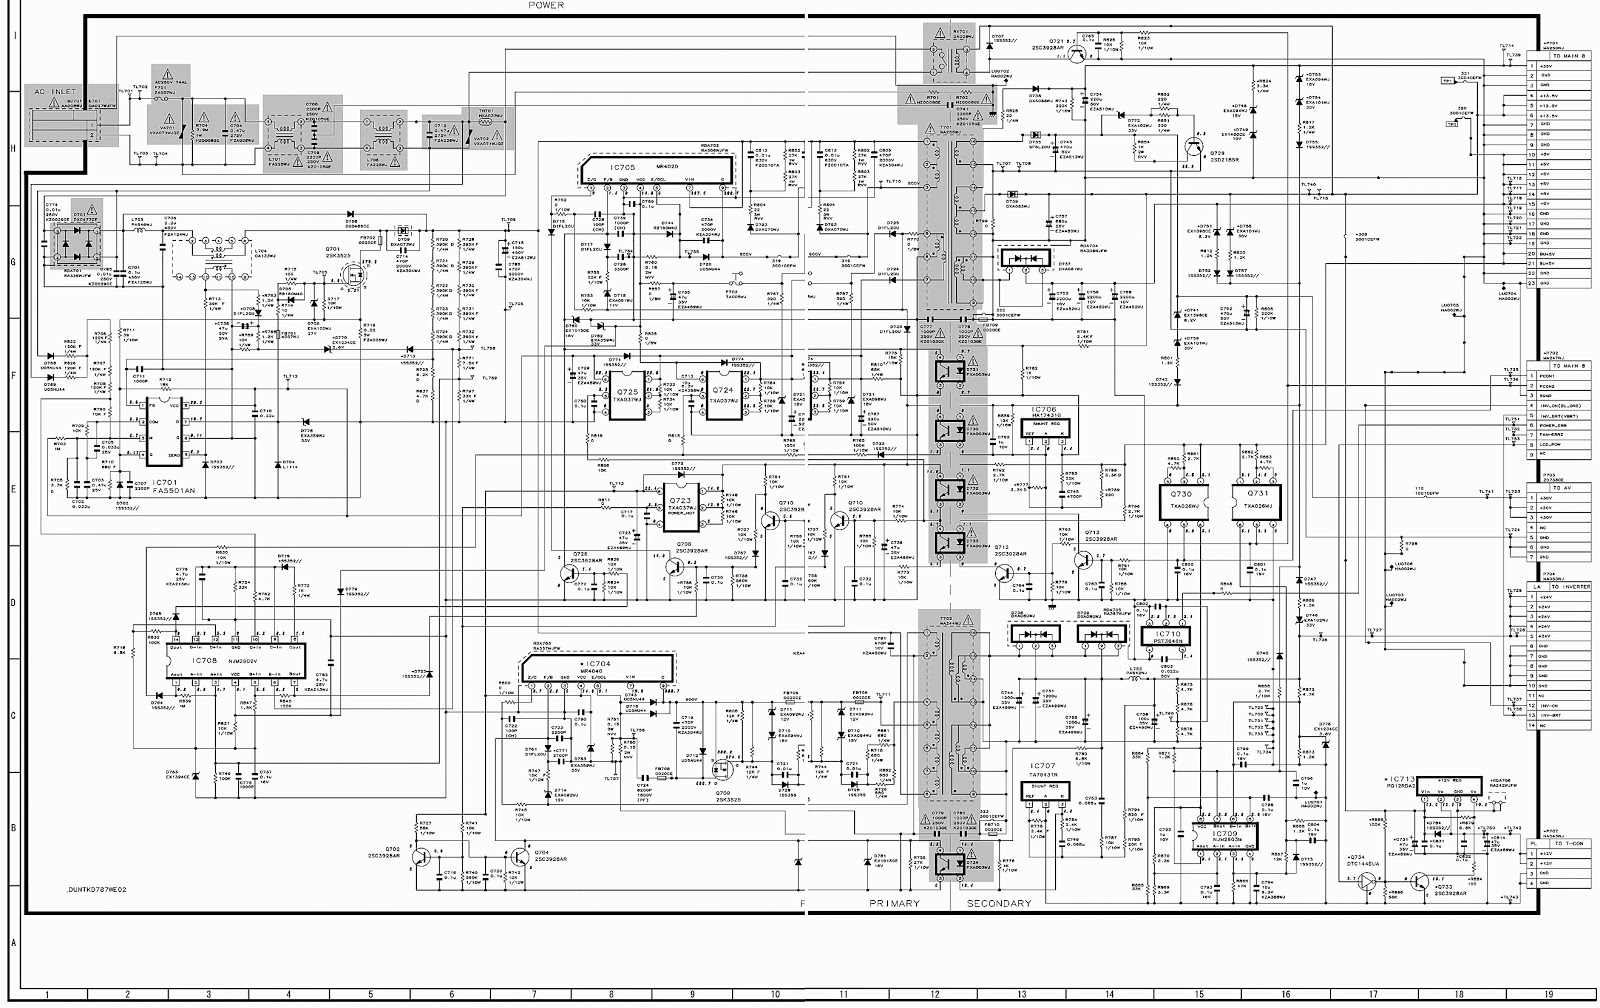 Electro help: Sharp LC-37XD1E/RU – DUNTKD787WE01